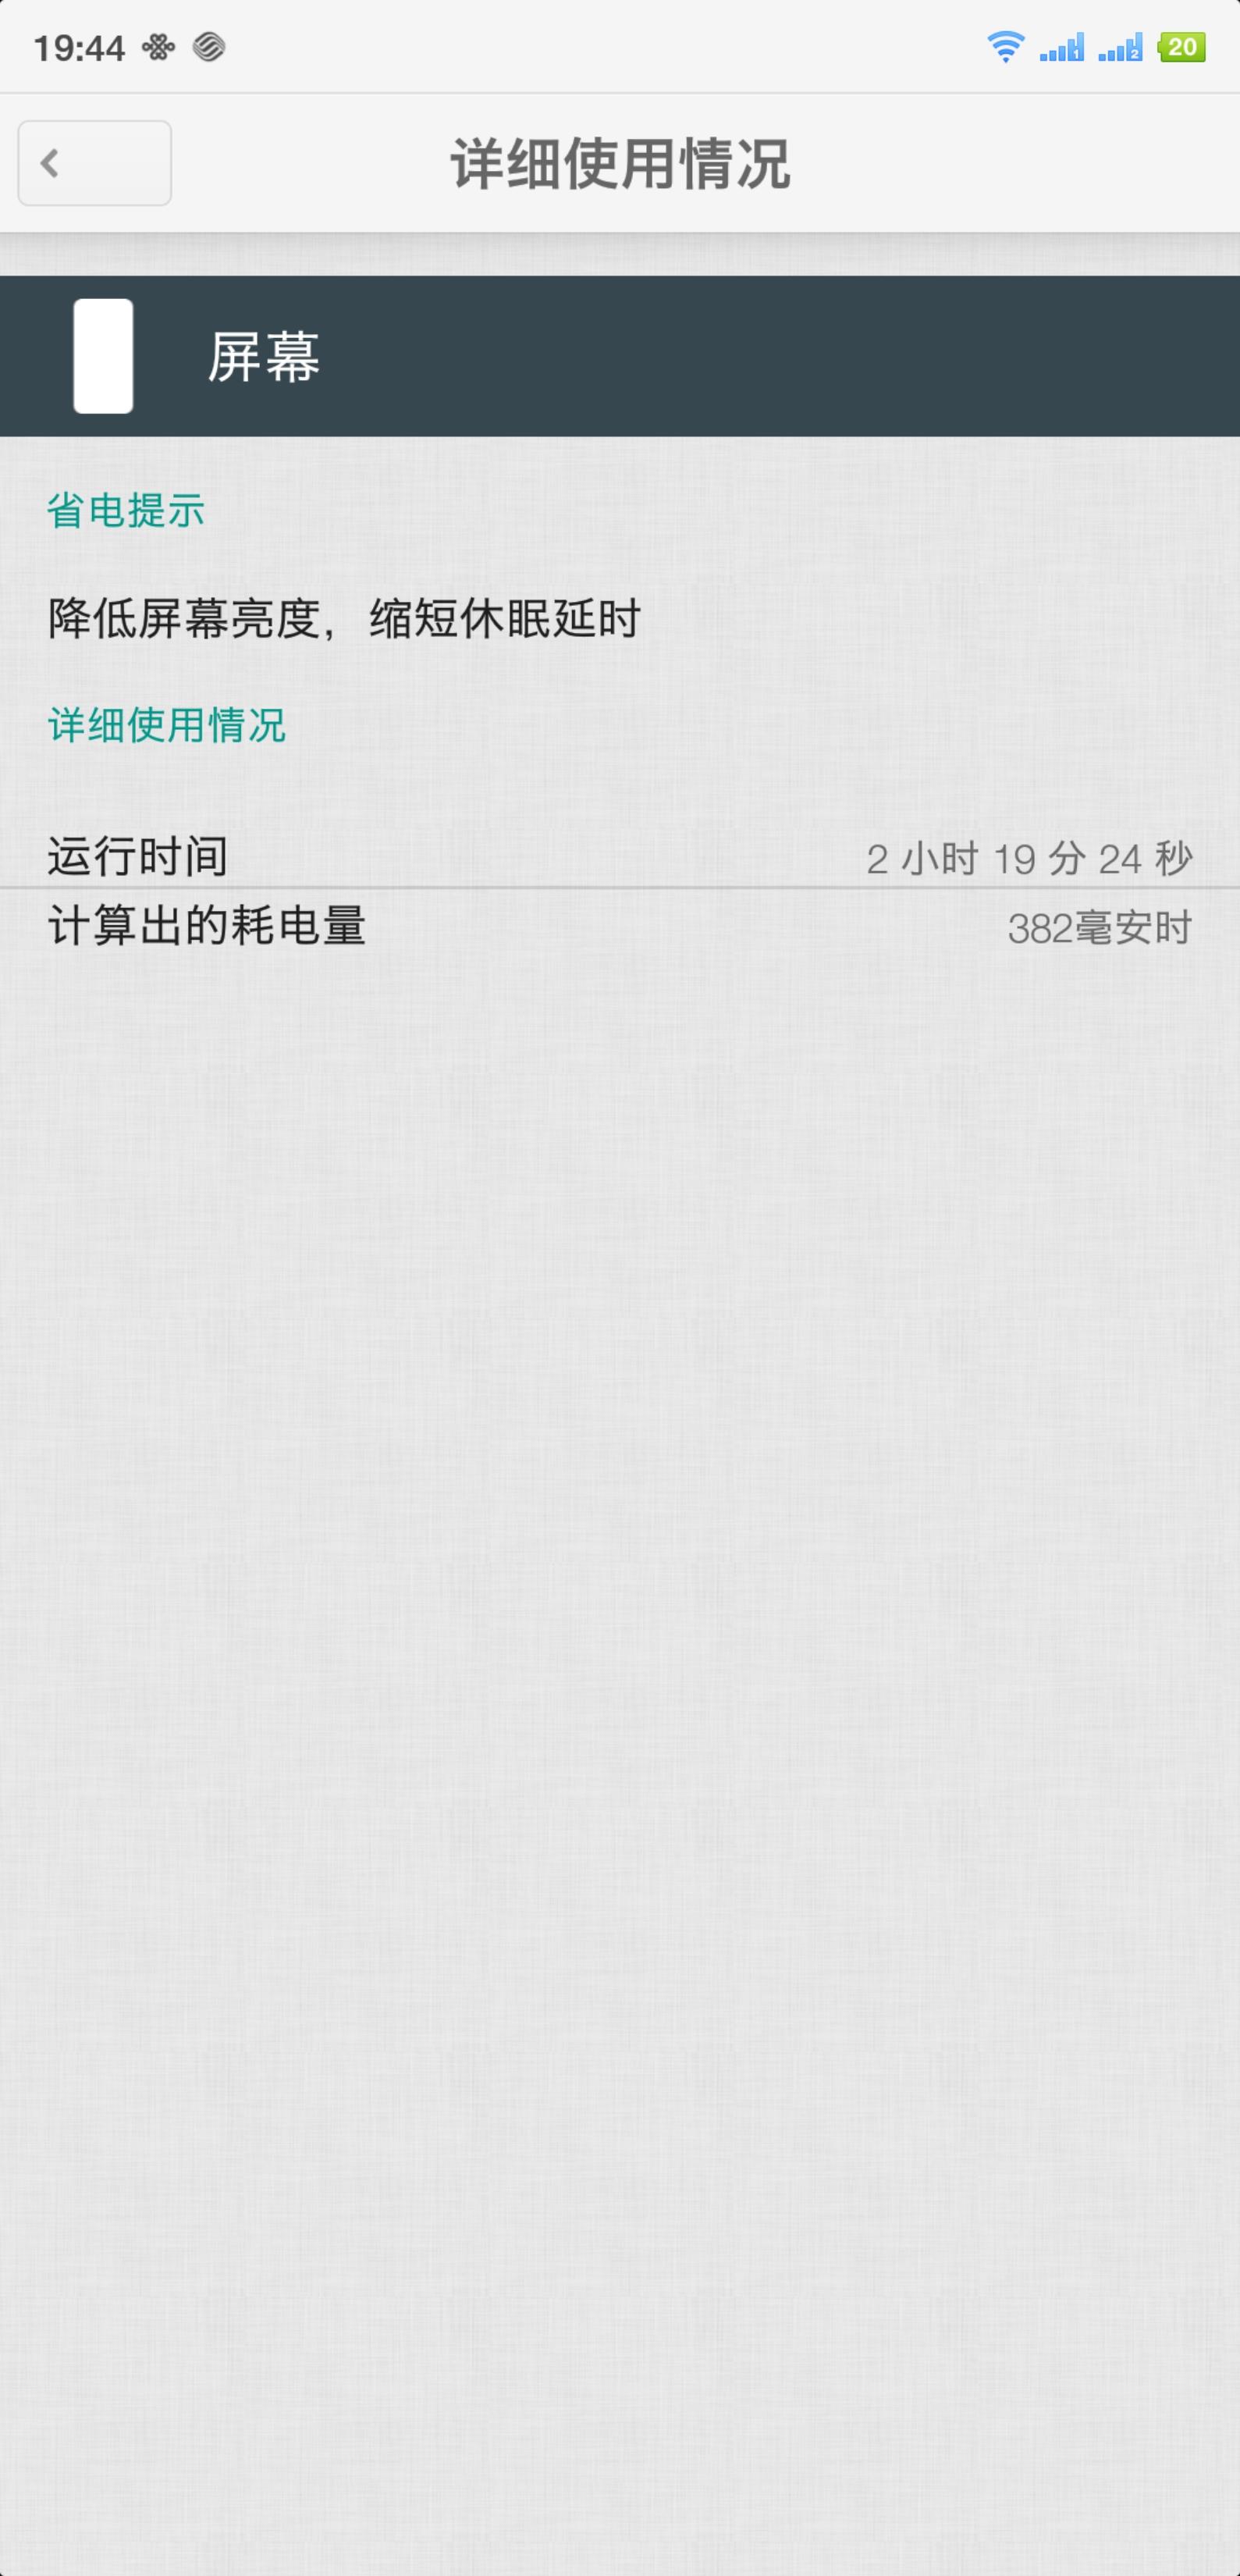 Screenshot_2018-07-12-19-44-35-458_??.png